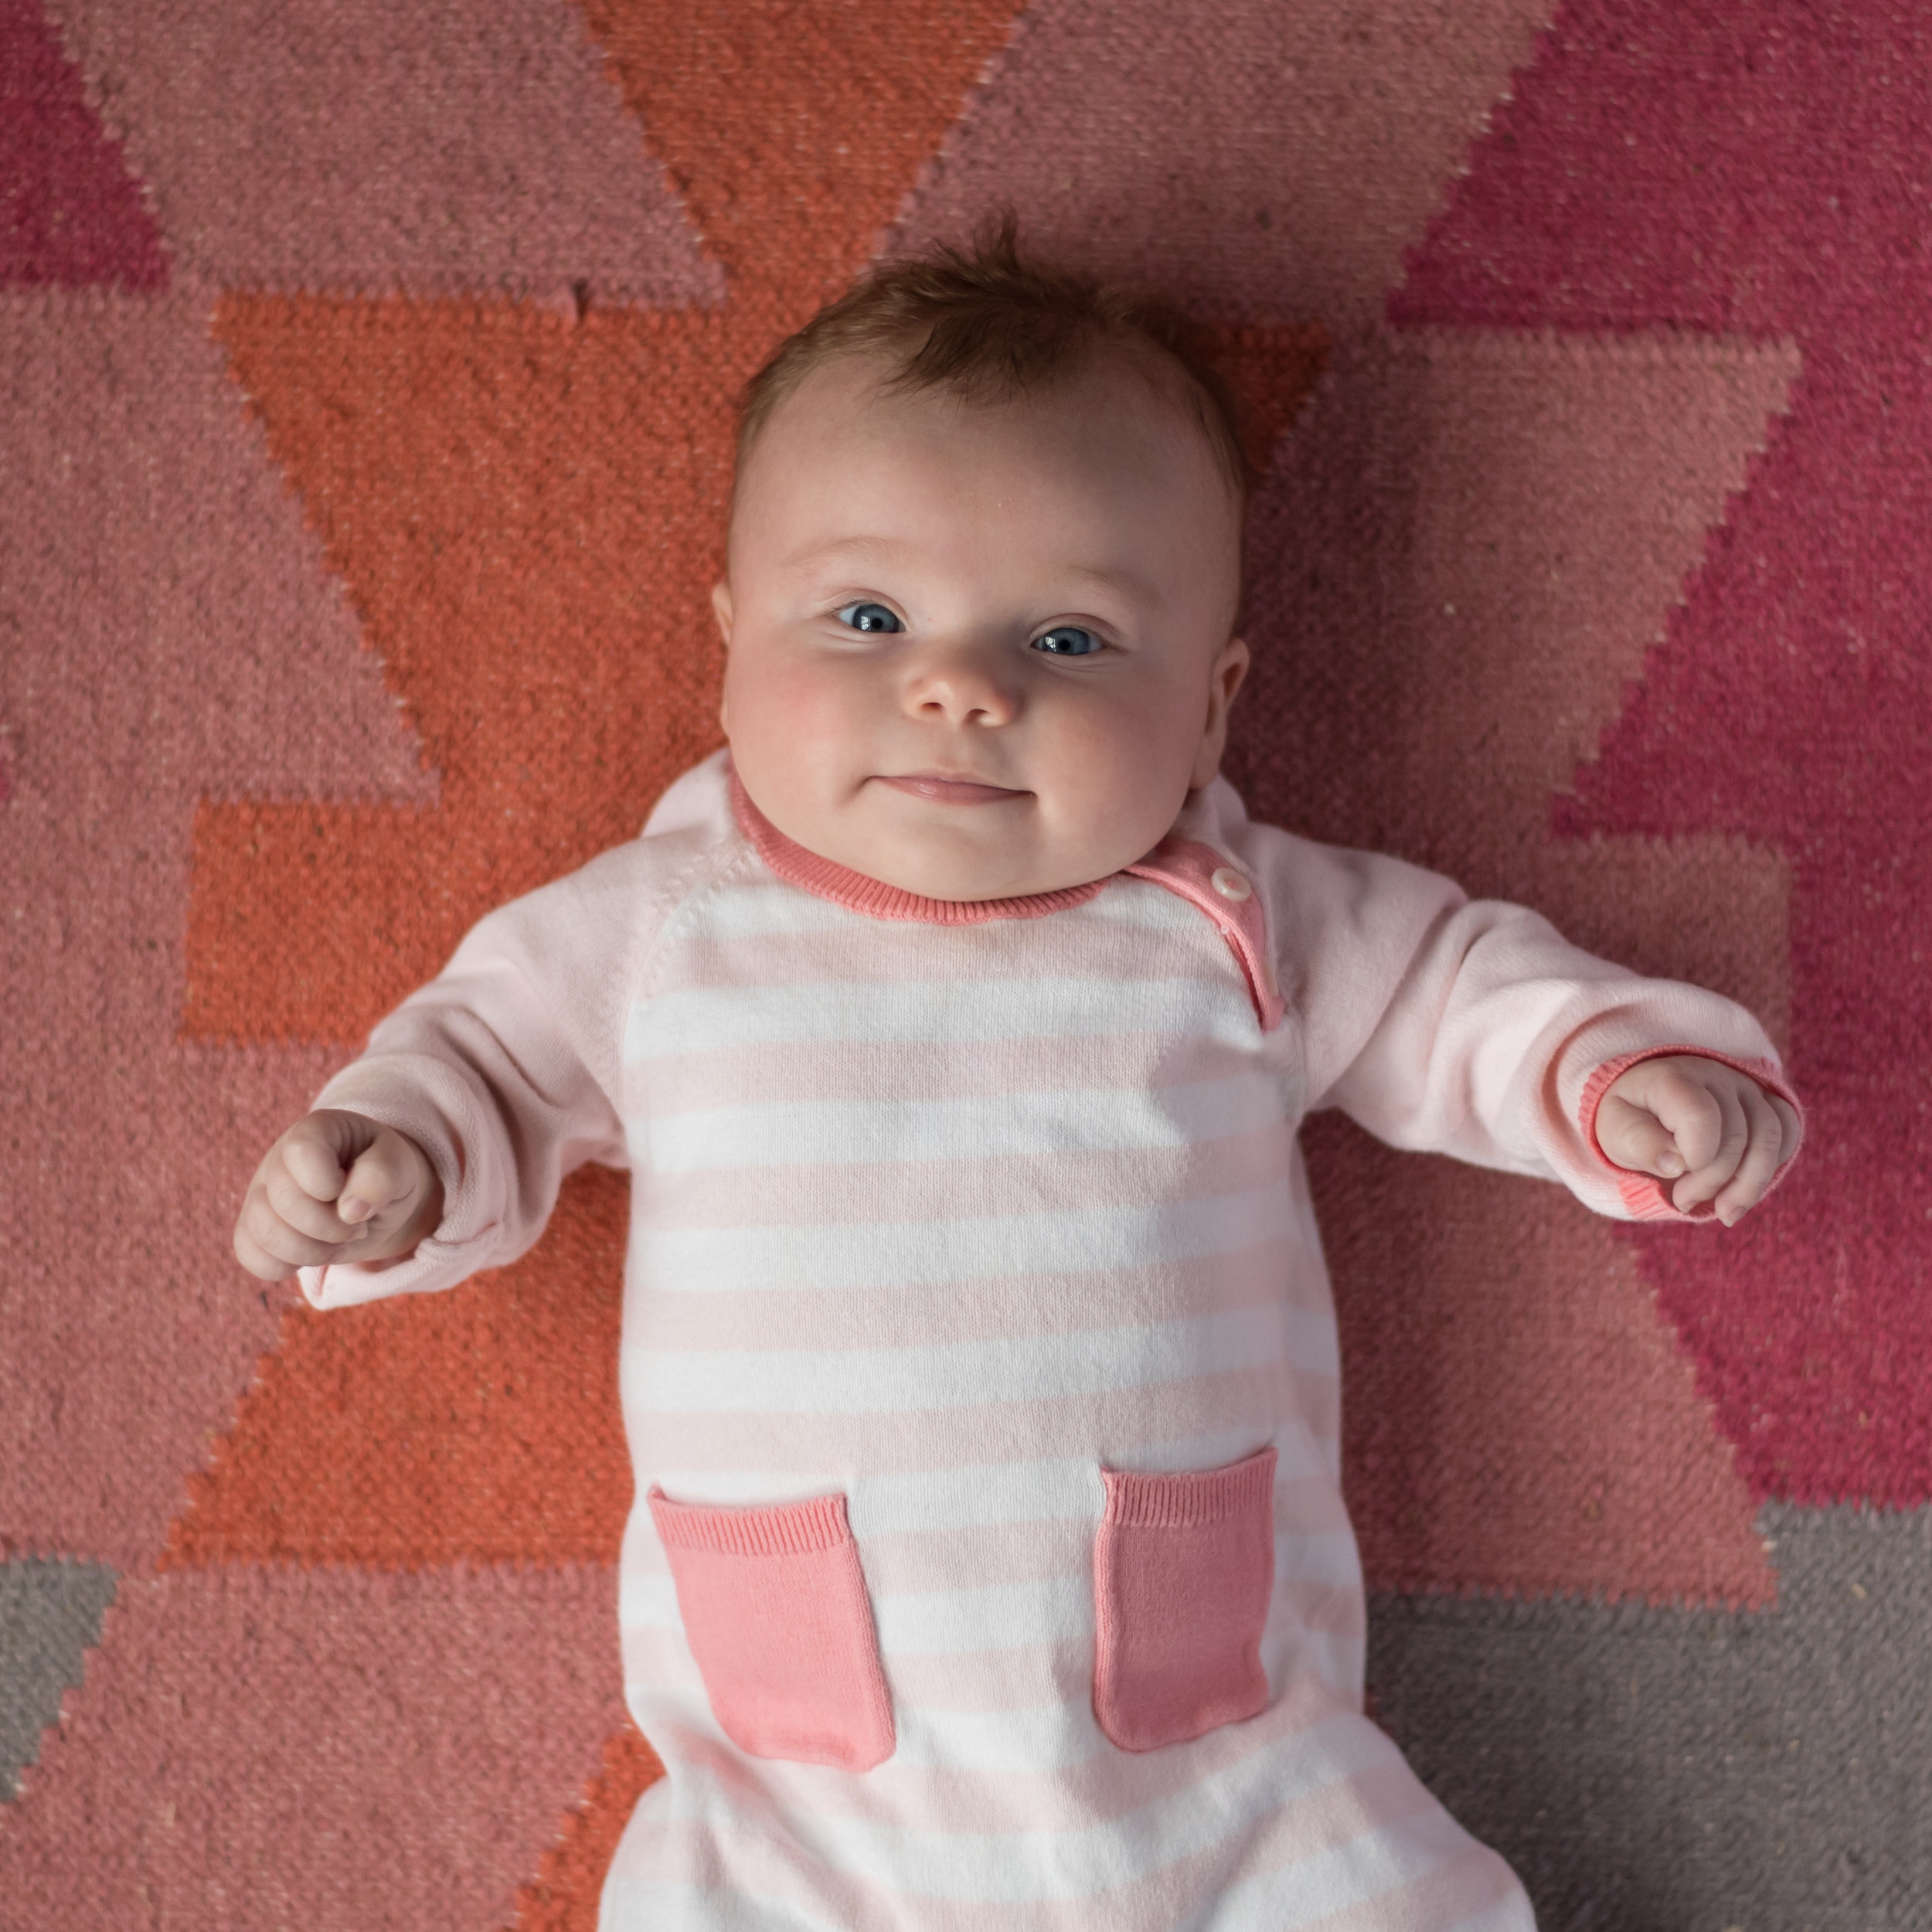 Clara_Nursery_Rug_15weeks-3311_WEB.jpg